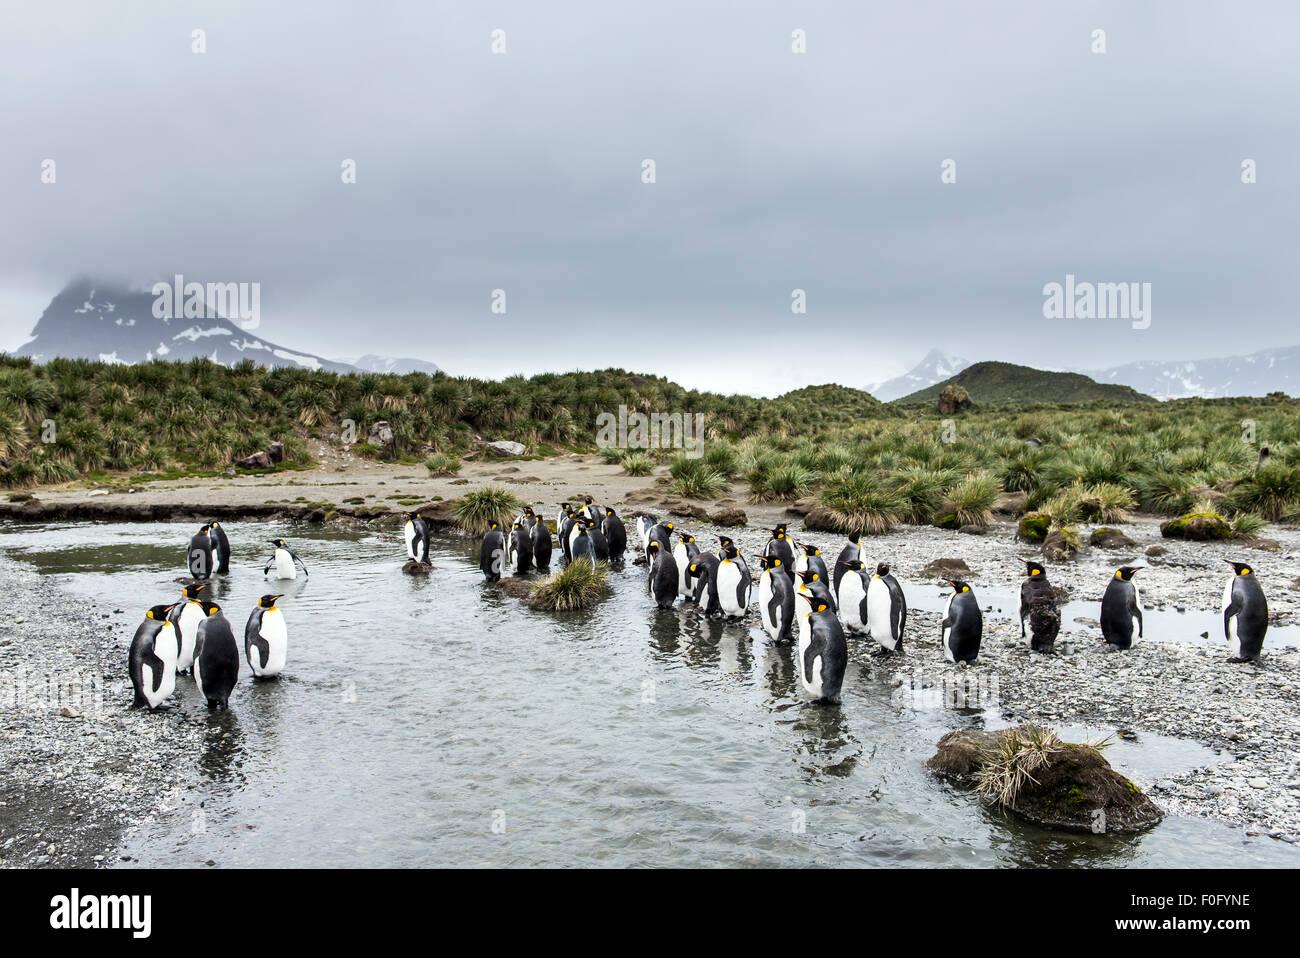 King penguins at colony Salisbury Plain South Georgia - Stock Image